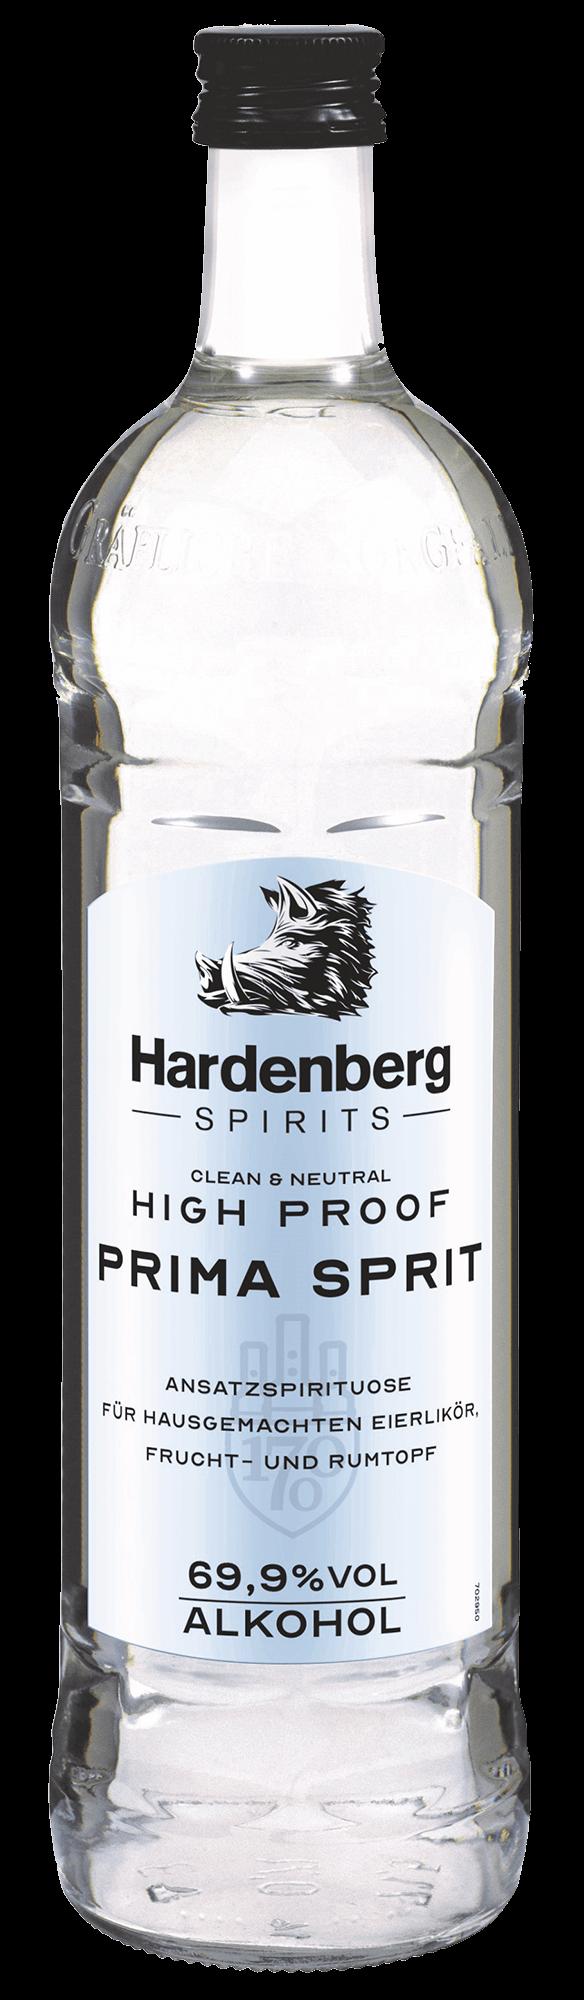 HARDENBERG PRIMA SPRIT 0,7l